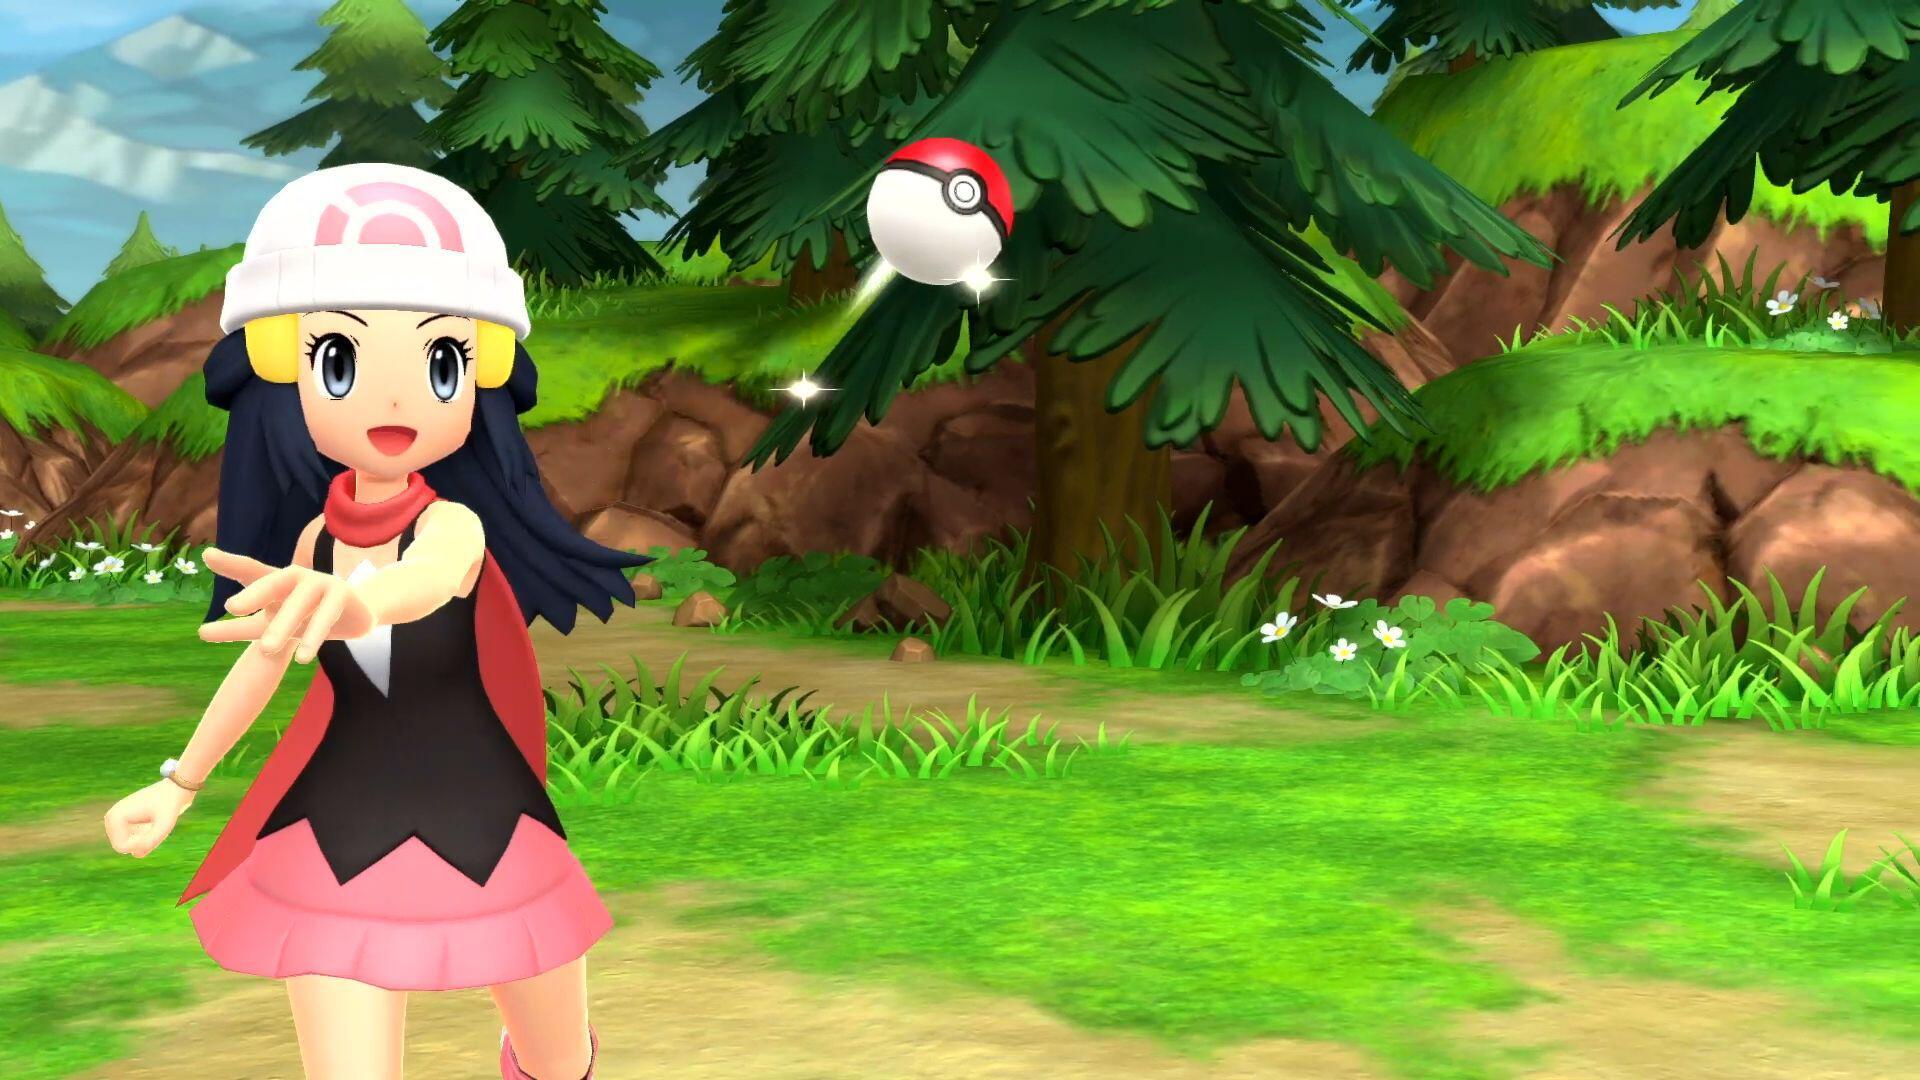 Bild zu Pokémon, Diamant, Perl, Perle, Switch, Nintendo, Remake, Pokemon, Legends, Acreus